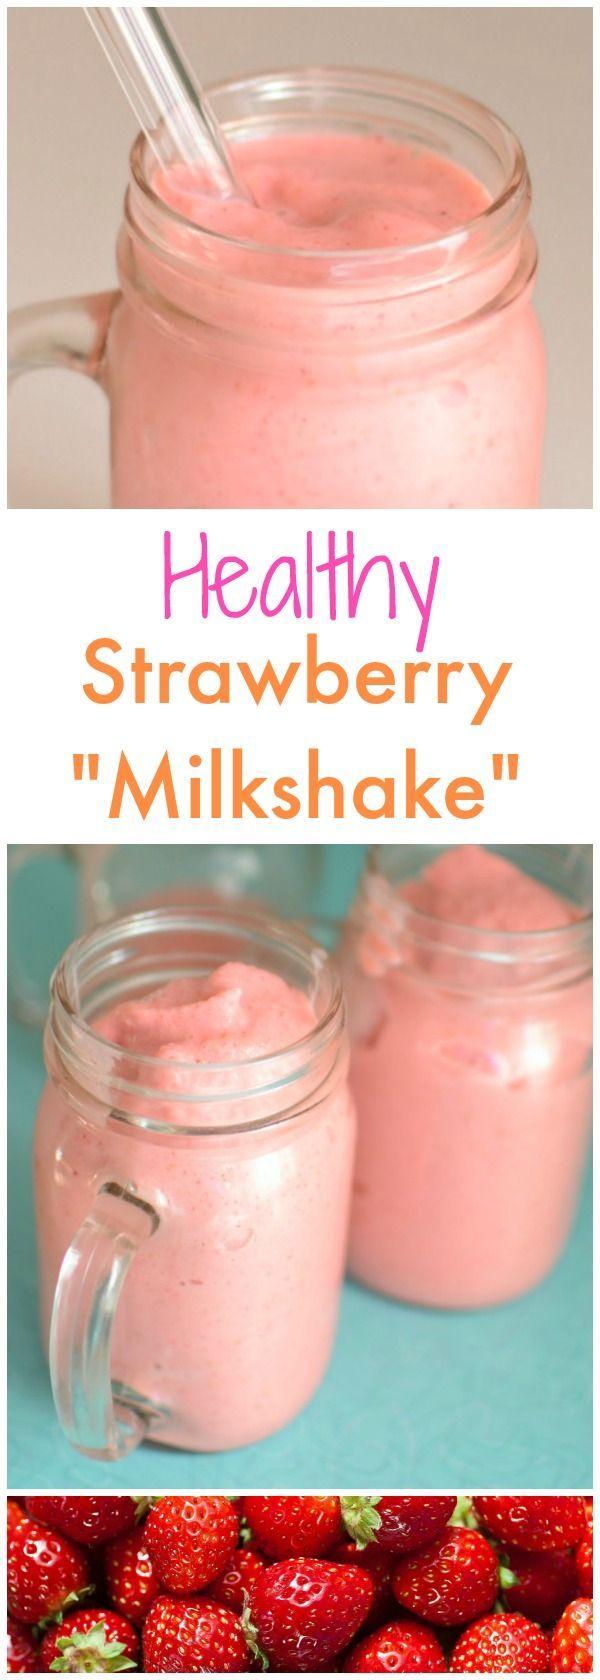 Guilt Free Strawberry Milkshakes Recipe!